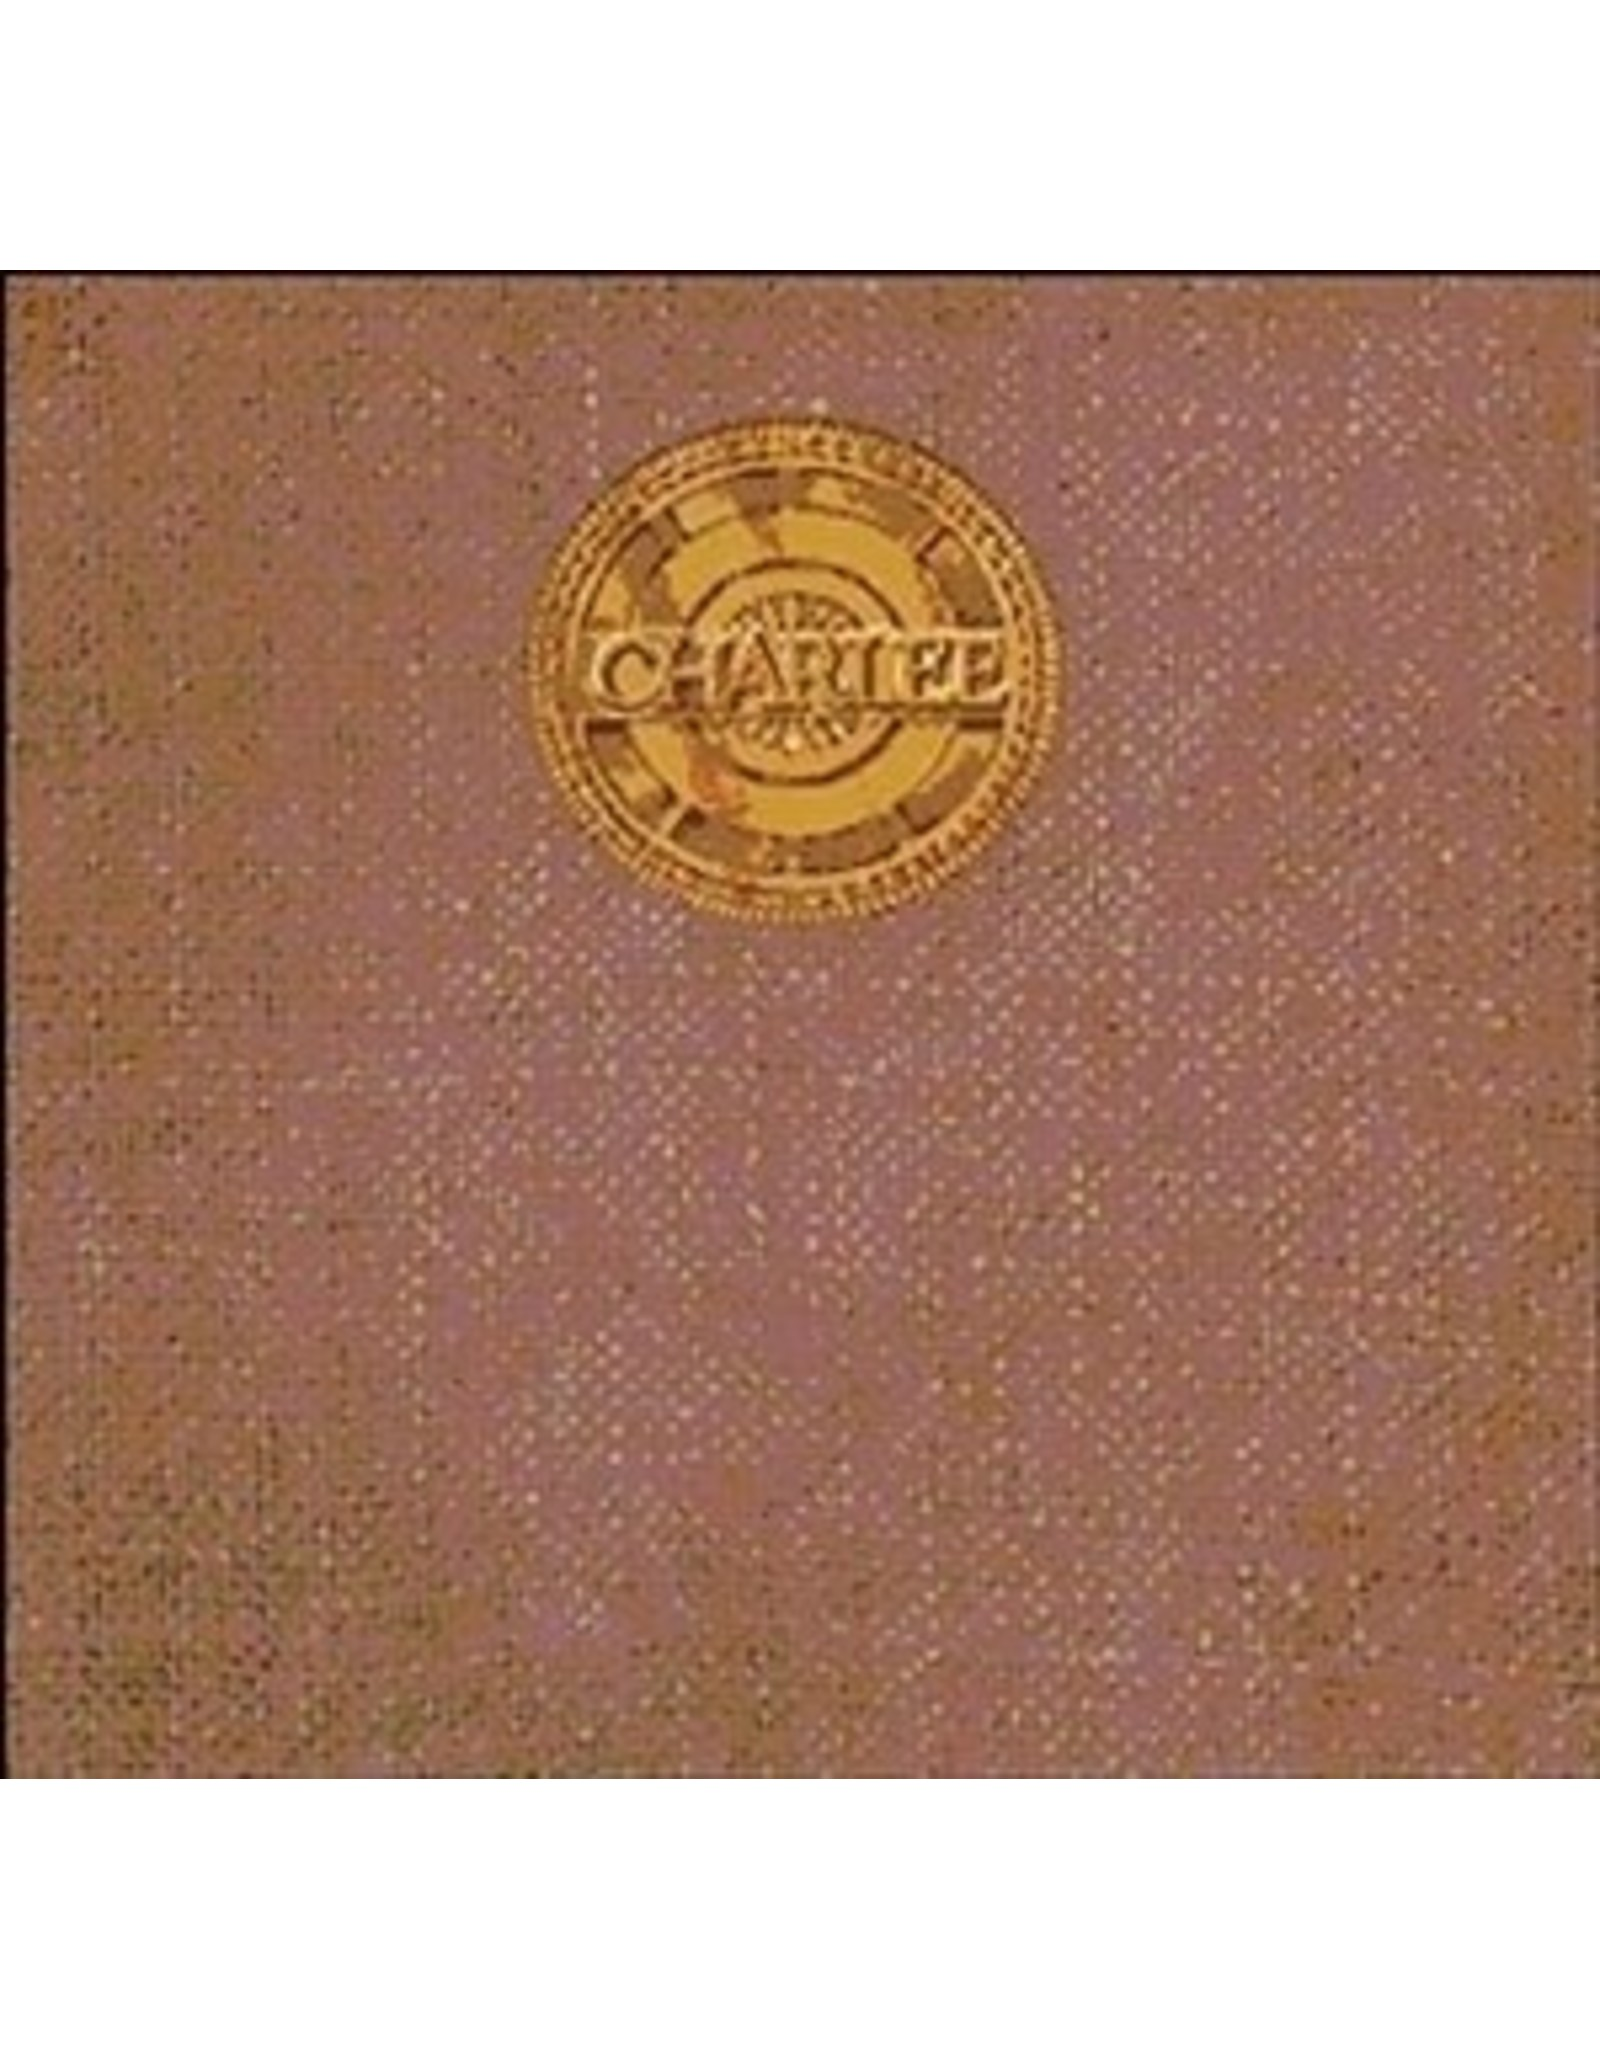 Vinyl Charlee - ST